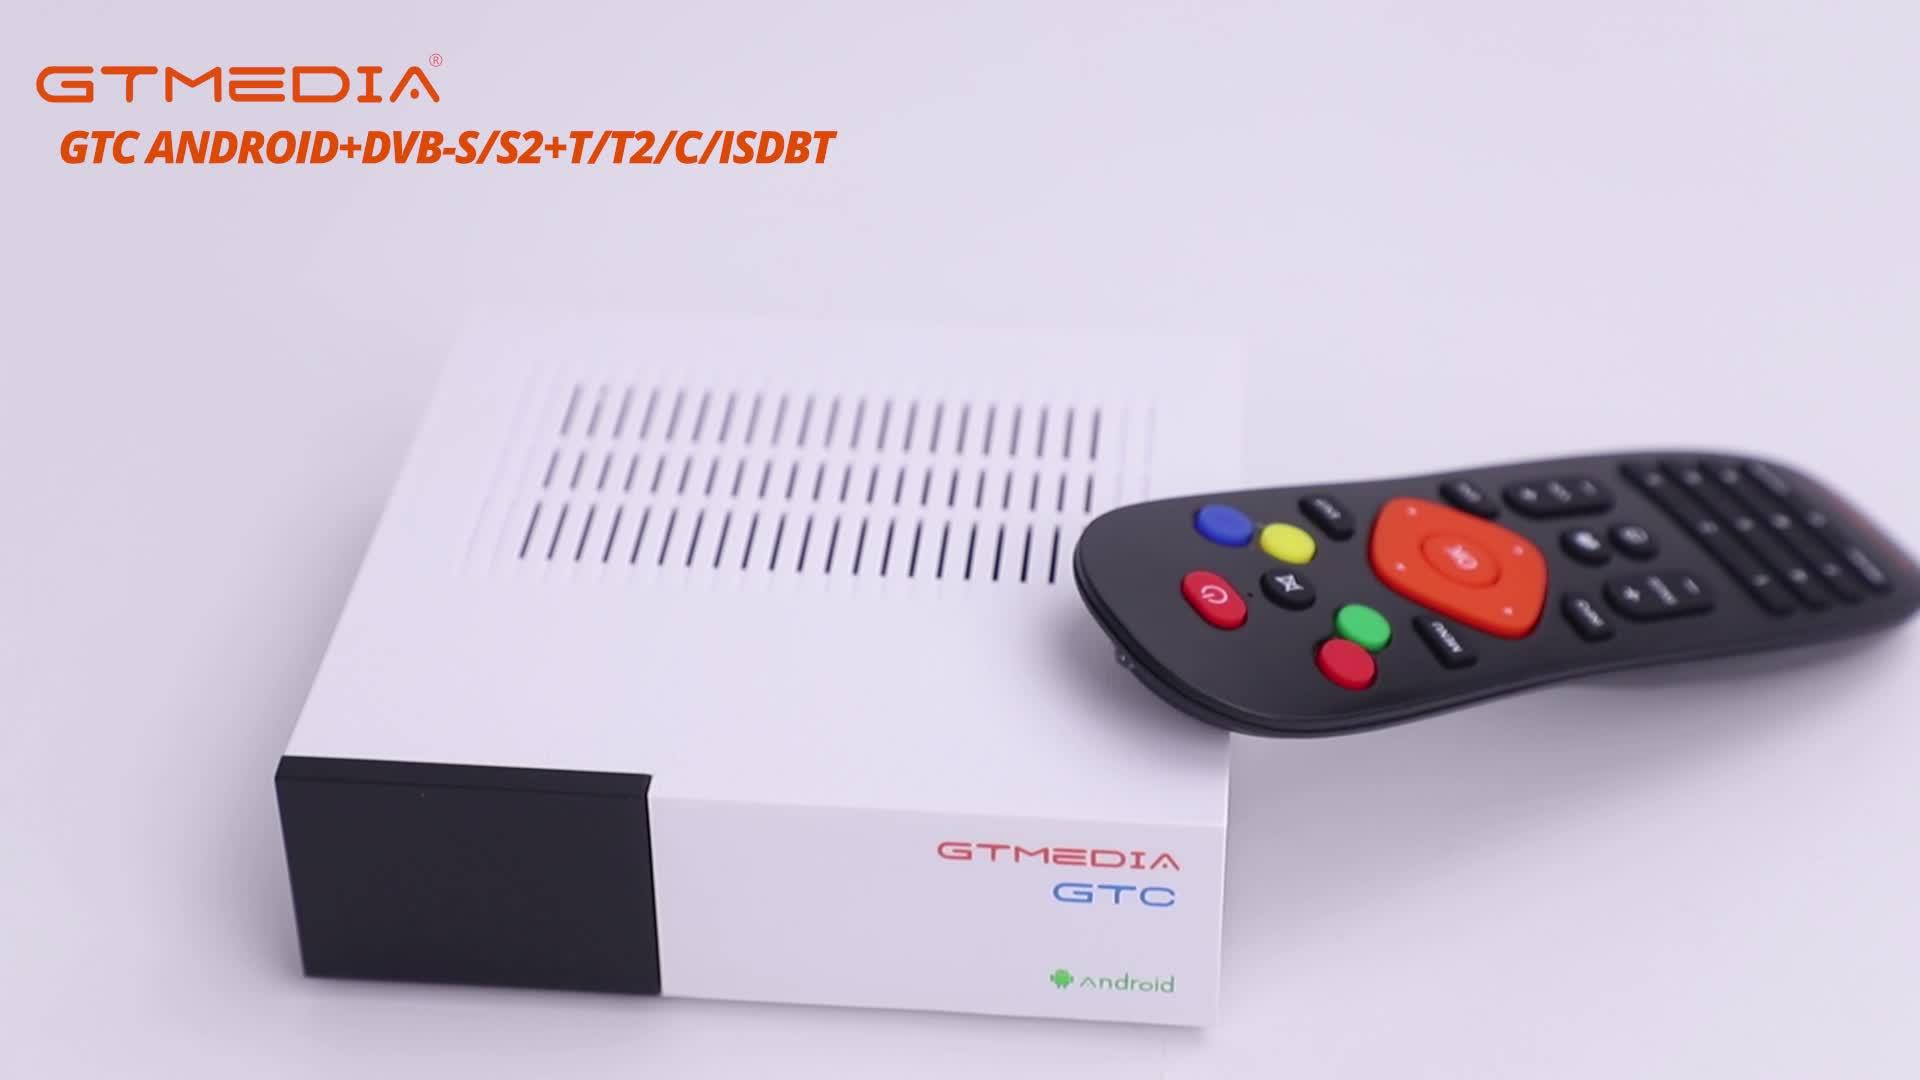 GTMedia Factory Wholesale DVB-S2+T2+C ISDBT GTC Android Amlogic S905D Solution Box 4k satellite receiver cccam